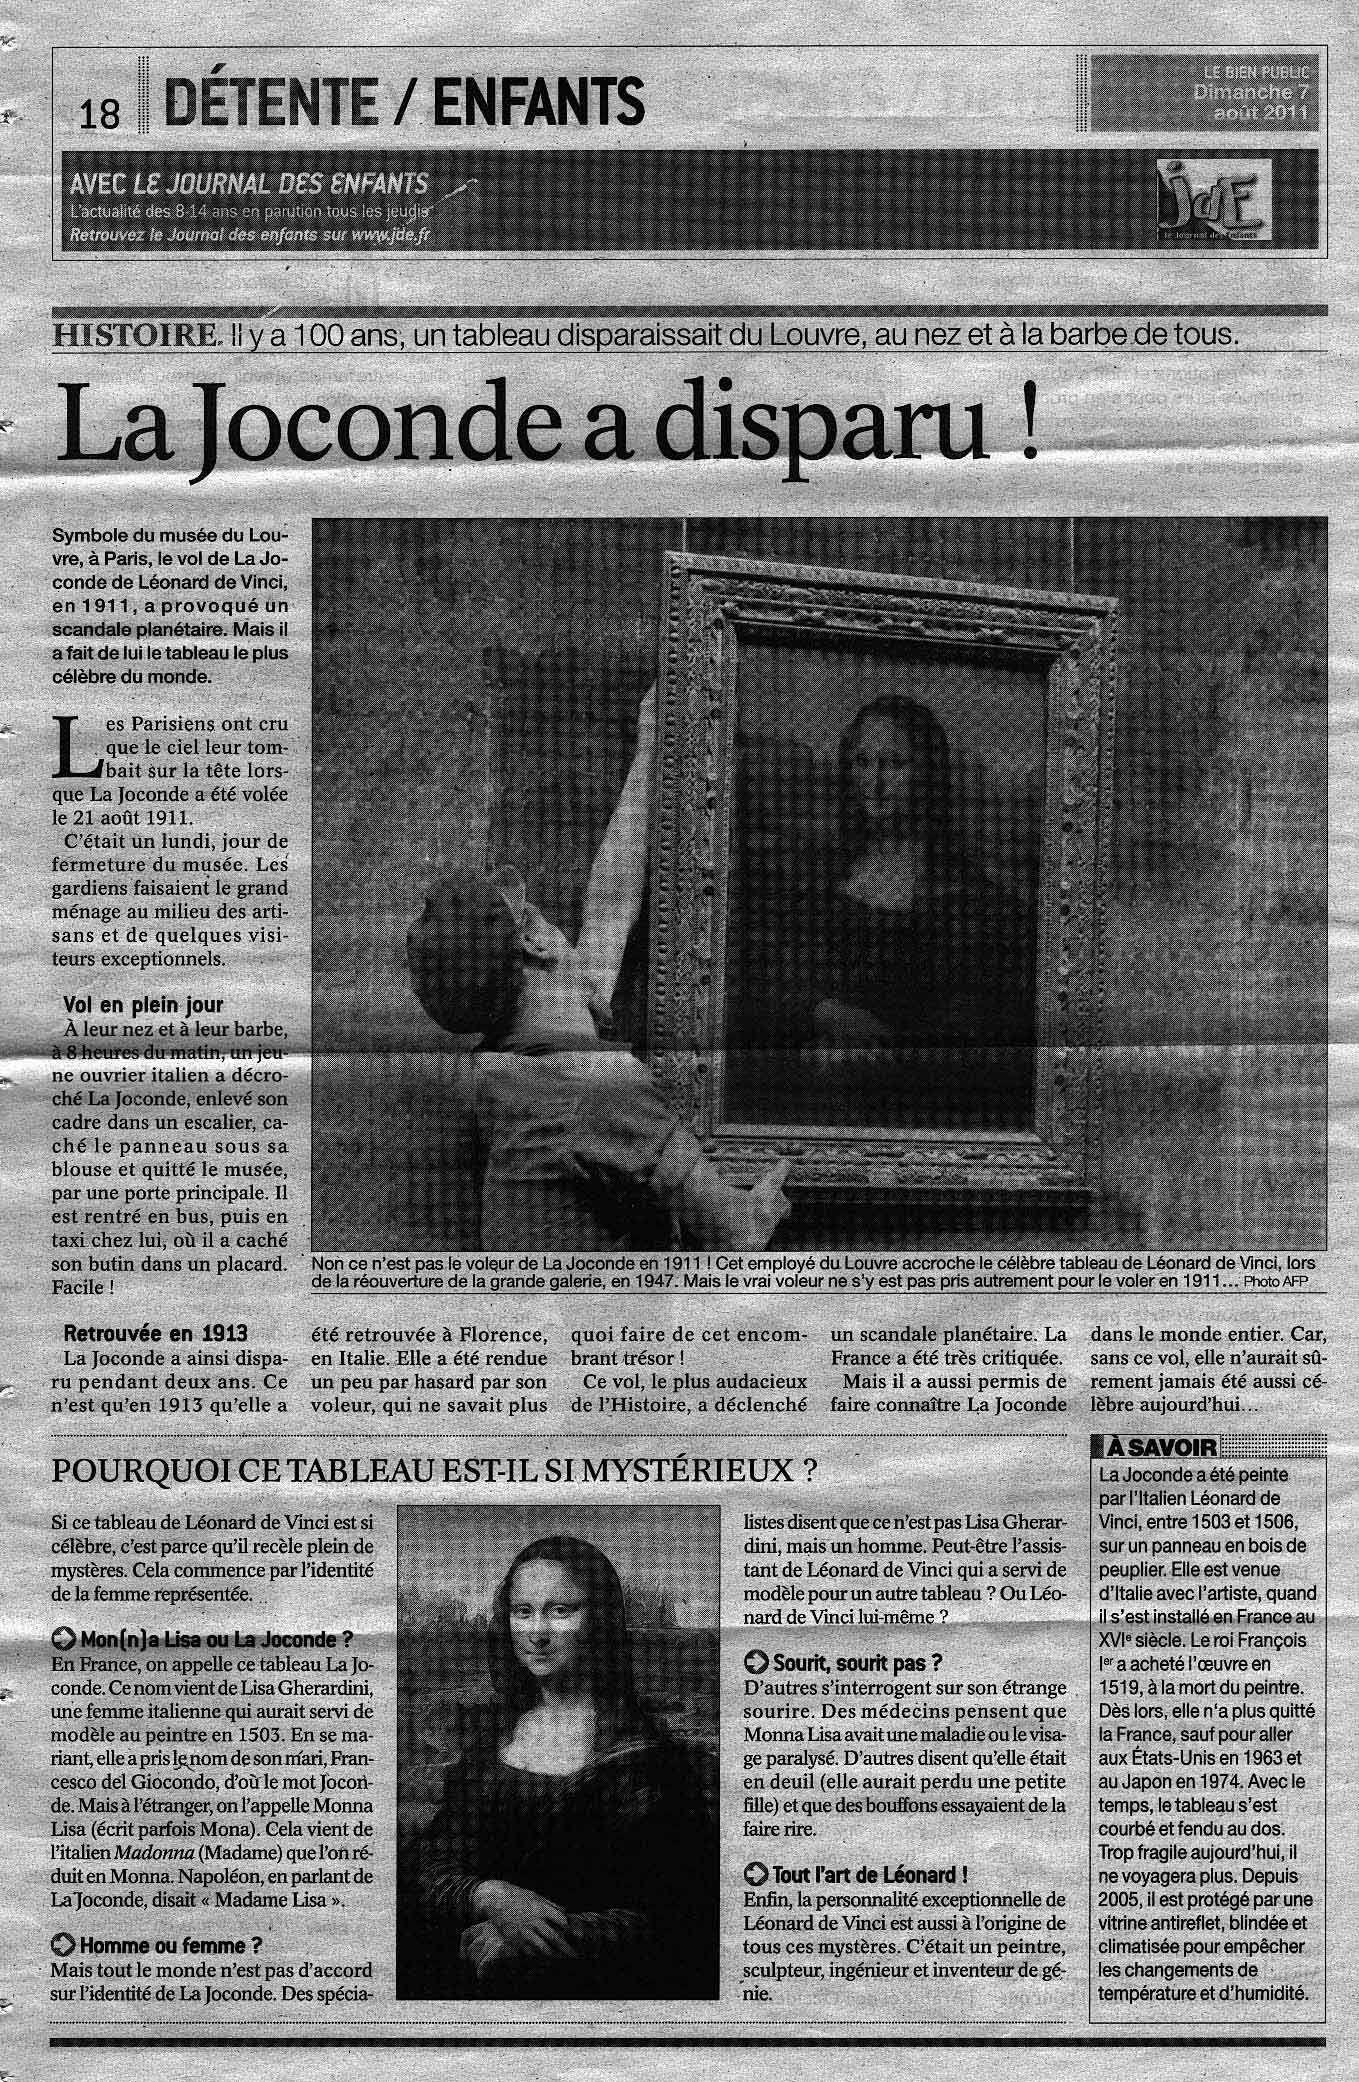 Le Vol De La Joconde Dans La Presse La Joconde Collage Recherche Google